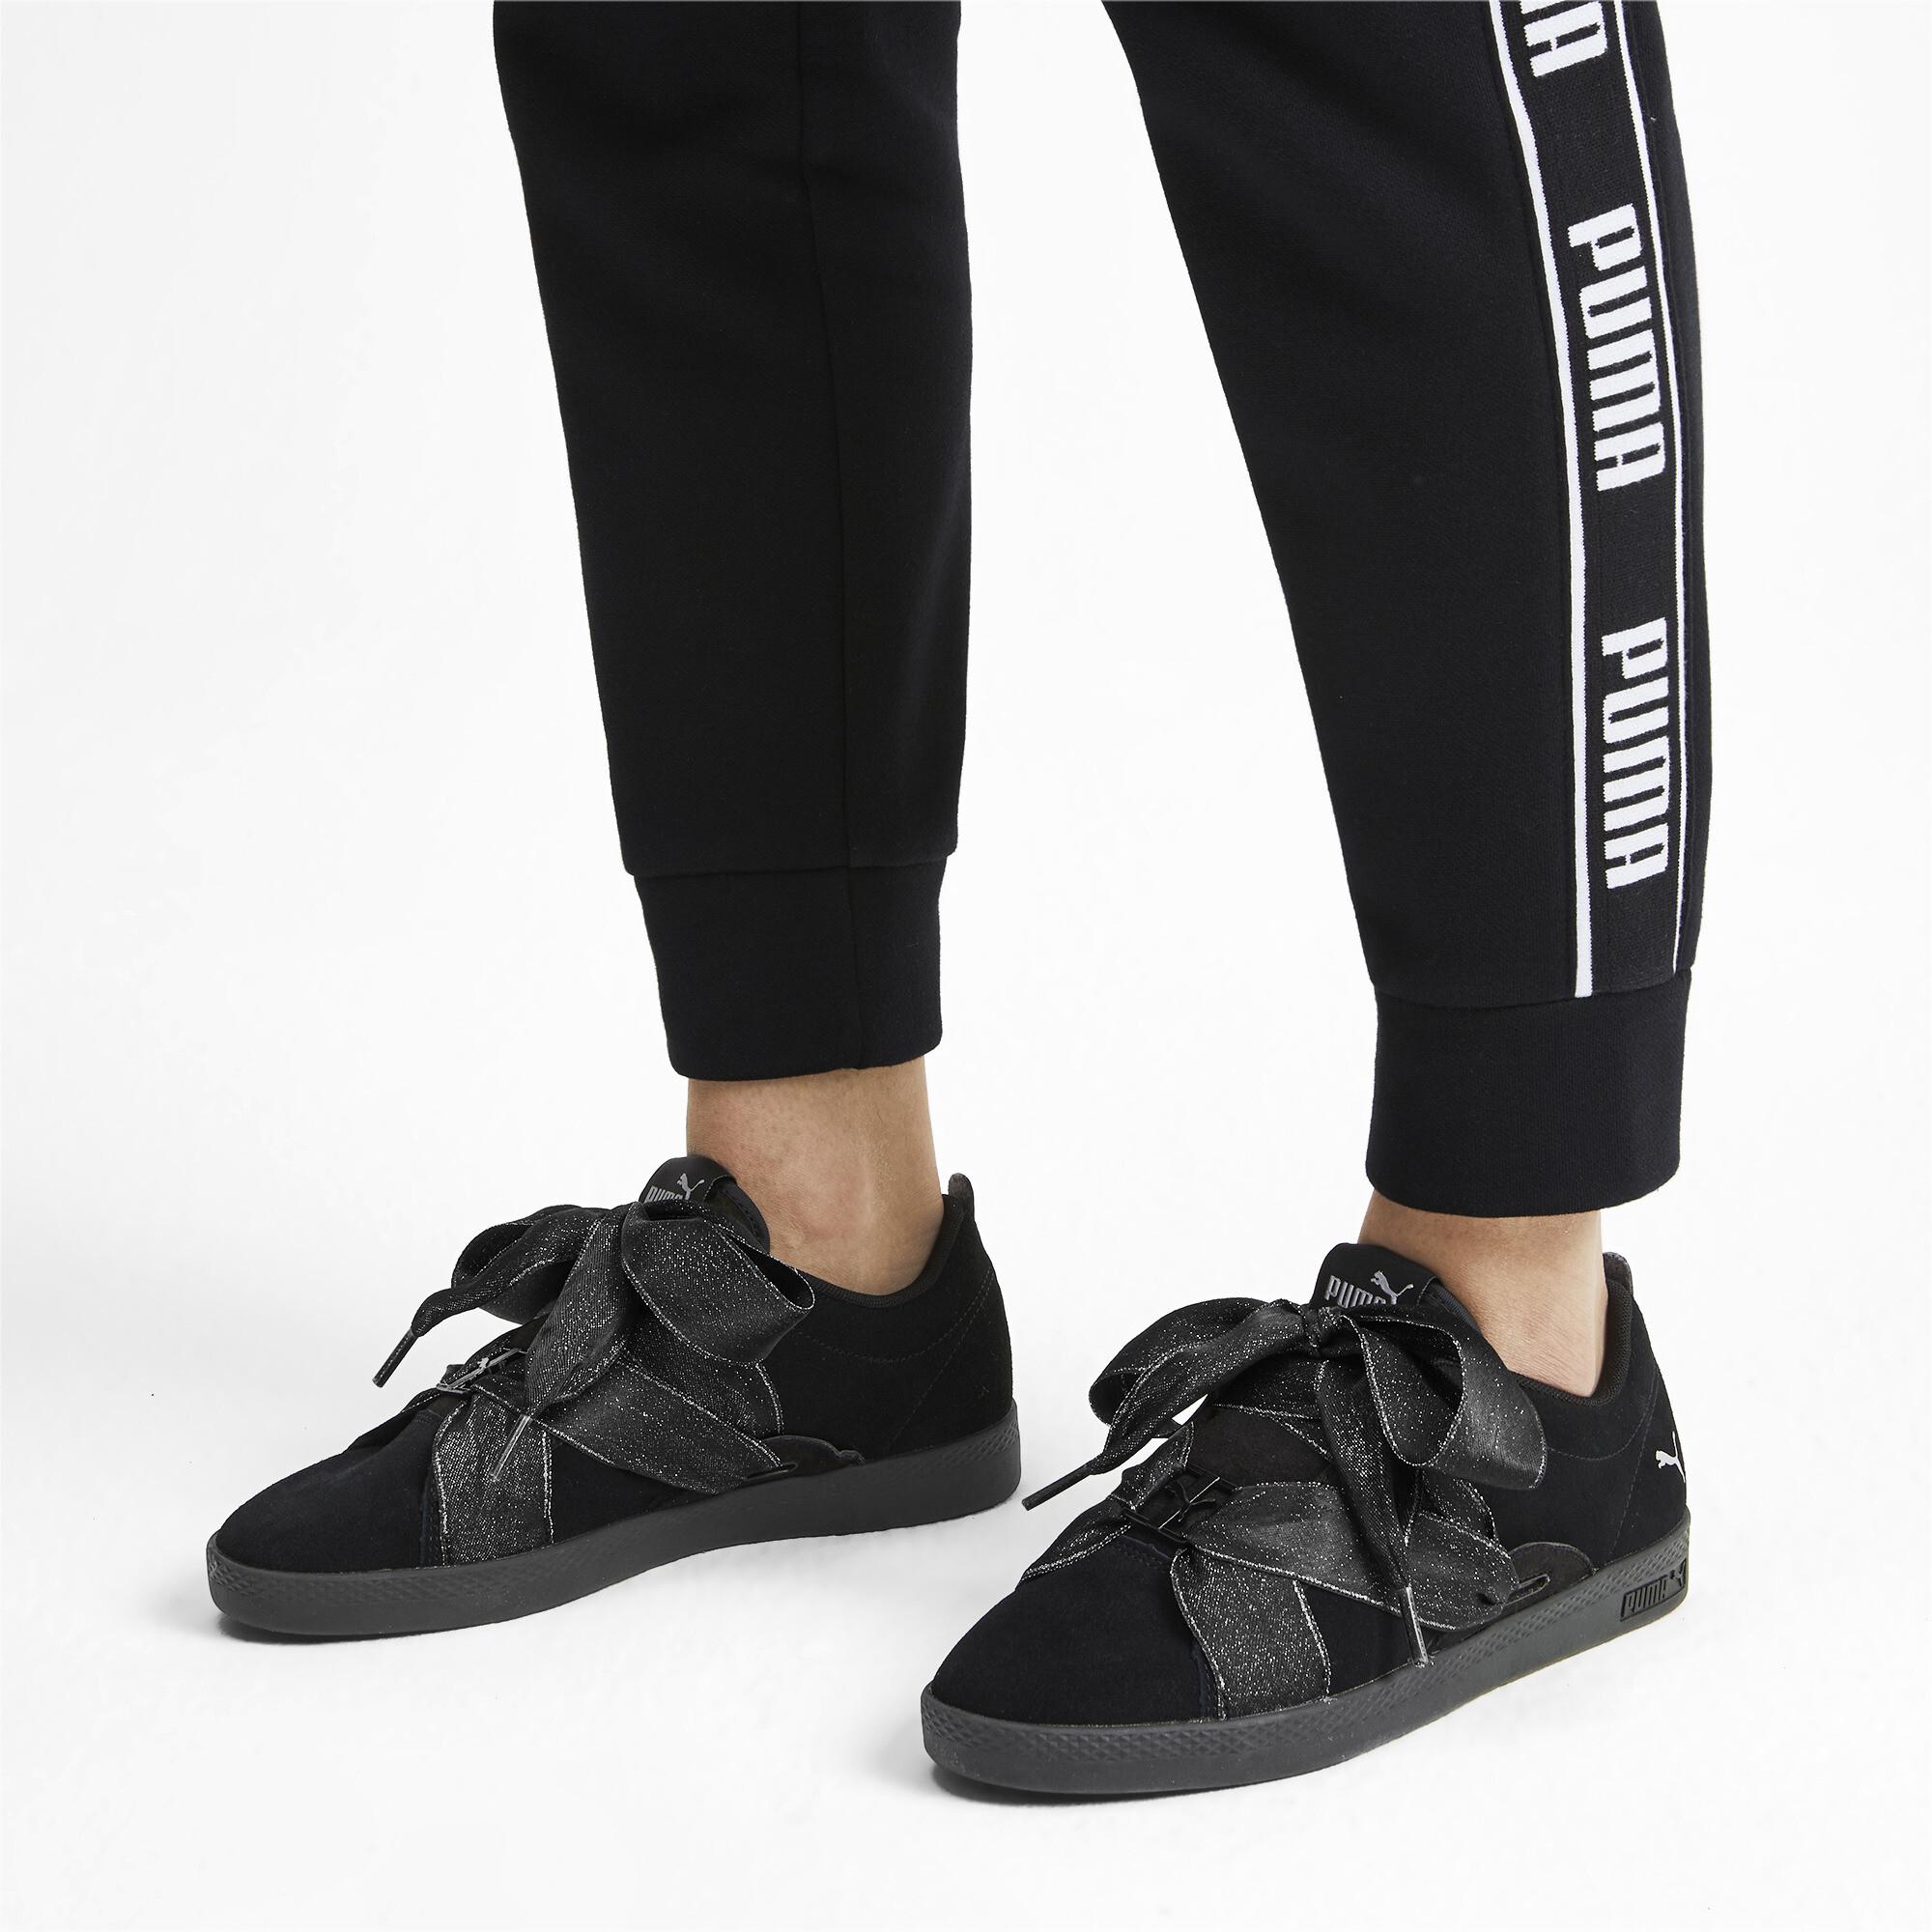 PUMA-PUMA-Smash-Astral-Buckle-Women-s-Sneakers-Women-Shoe-Basics thumbnail 12